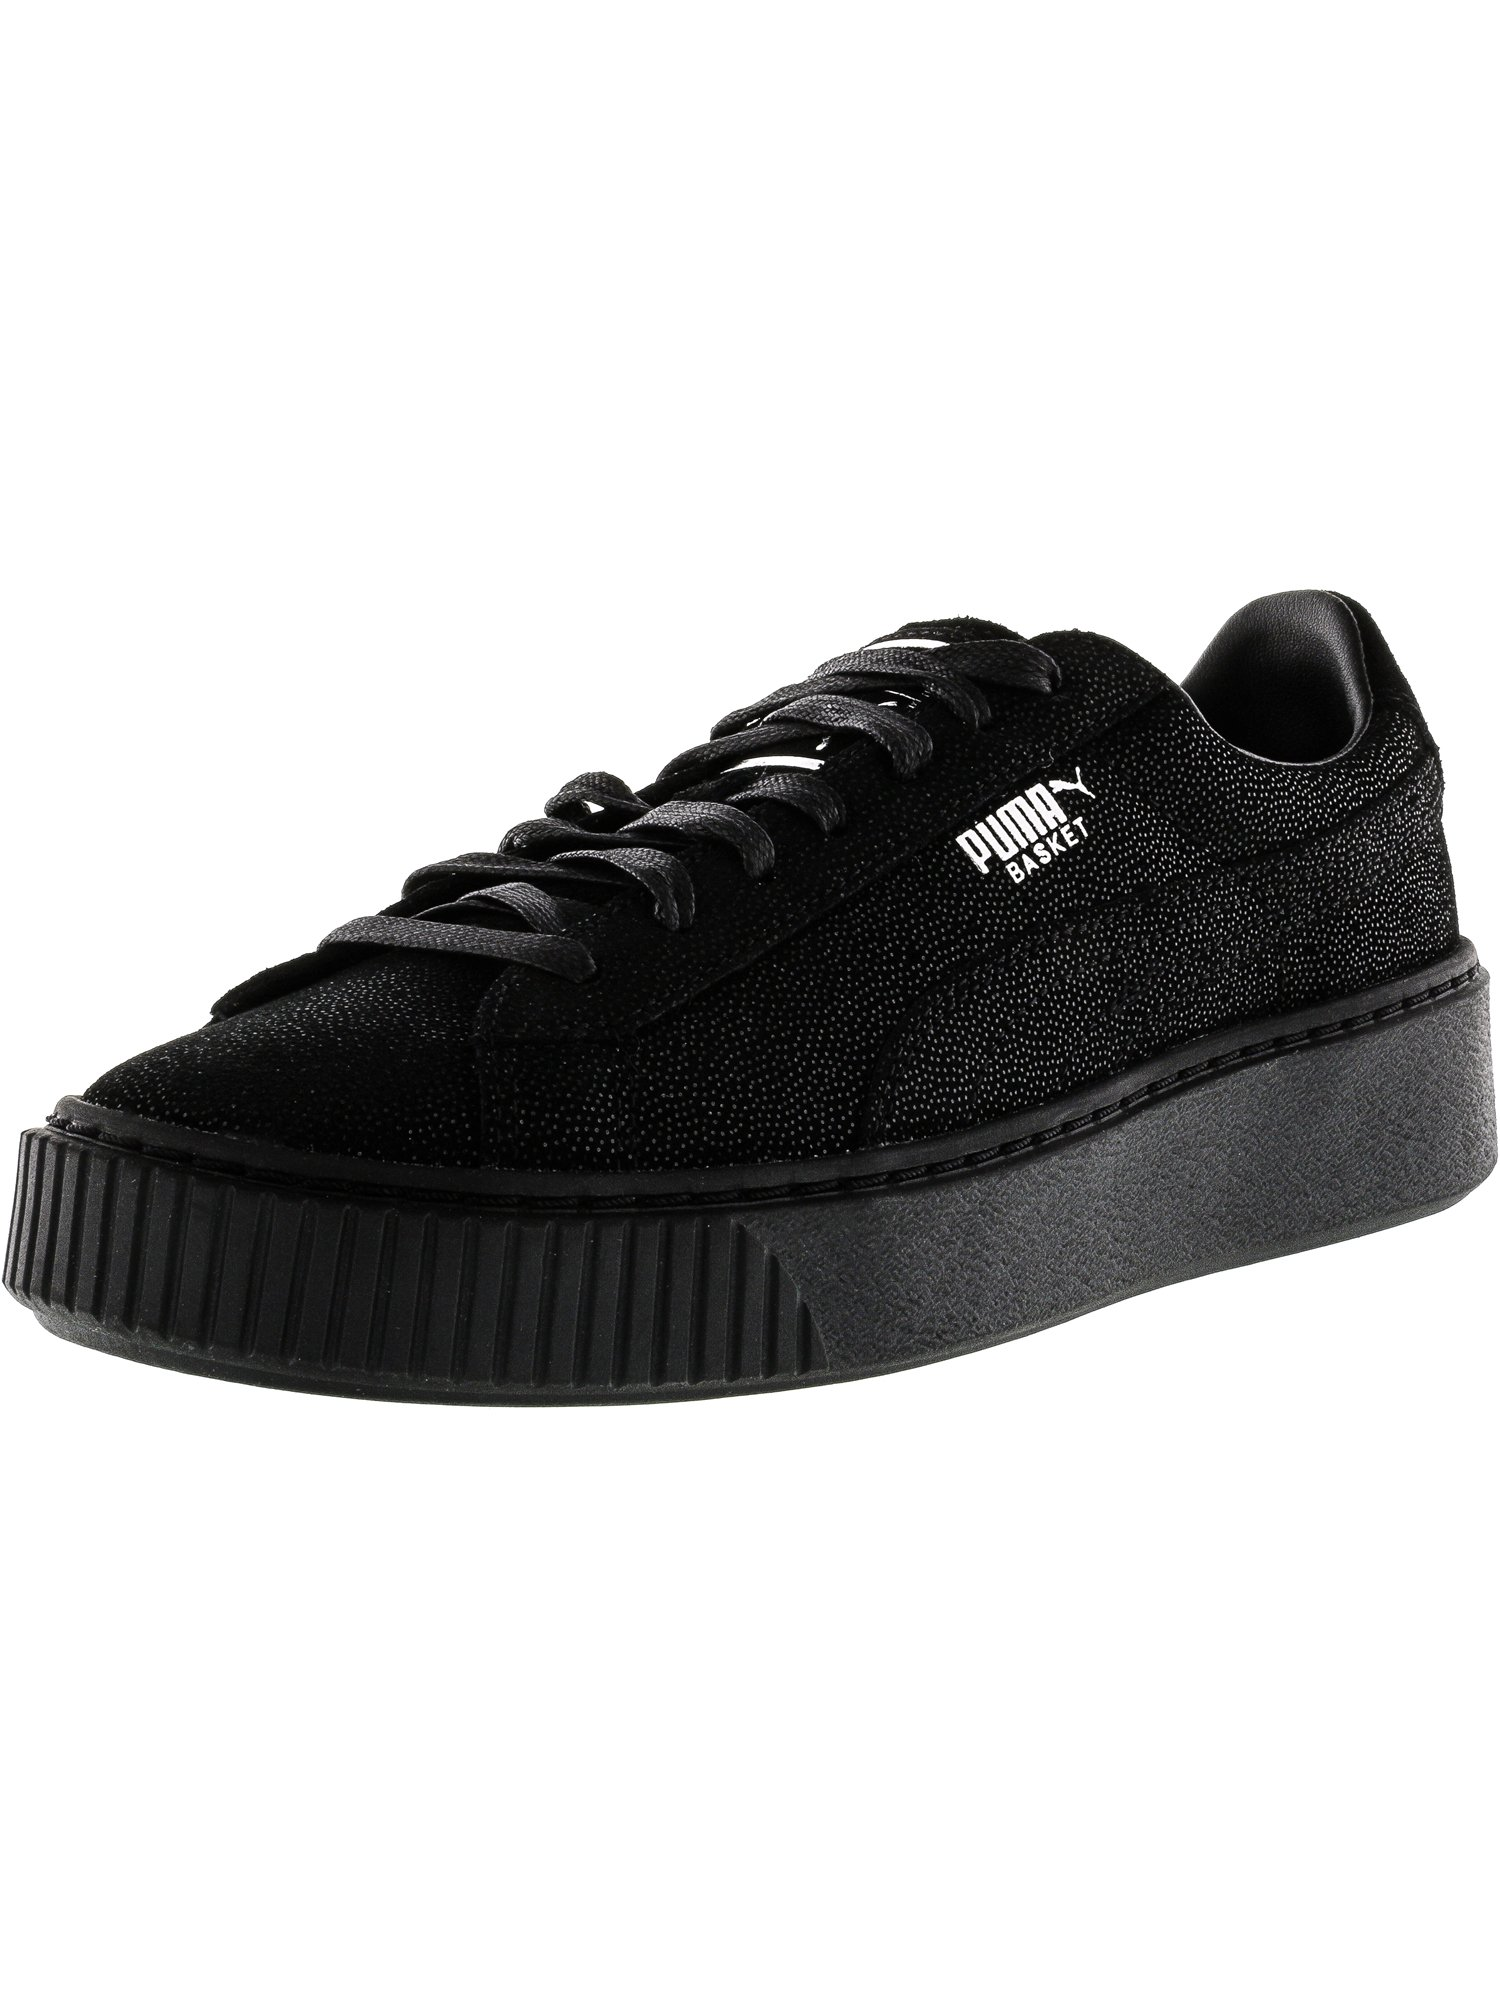 88338de46dcc Puma Women s Basket Platform Reset Black   Ankle-High Fashion Sneaker - 9.5M